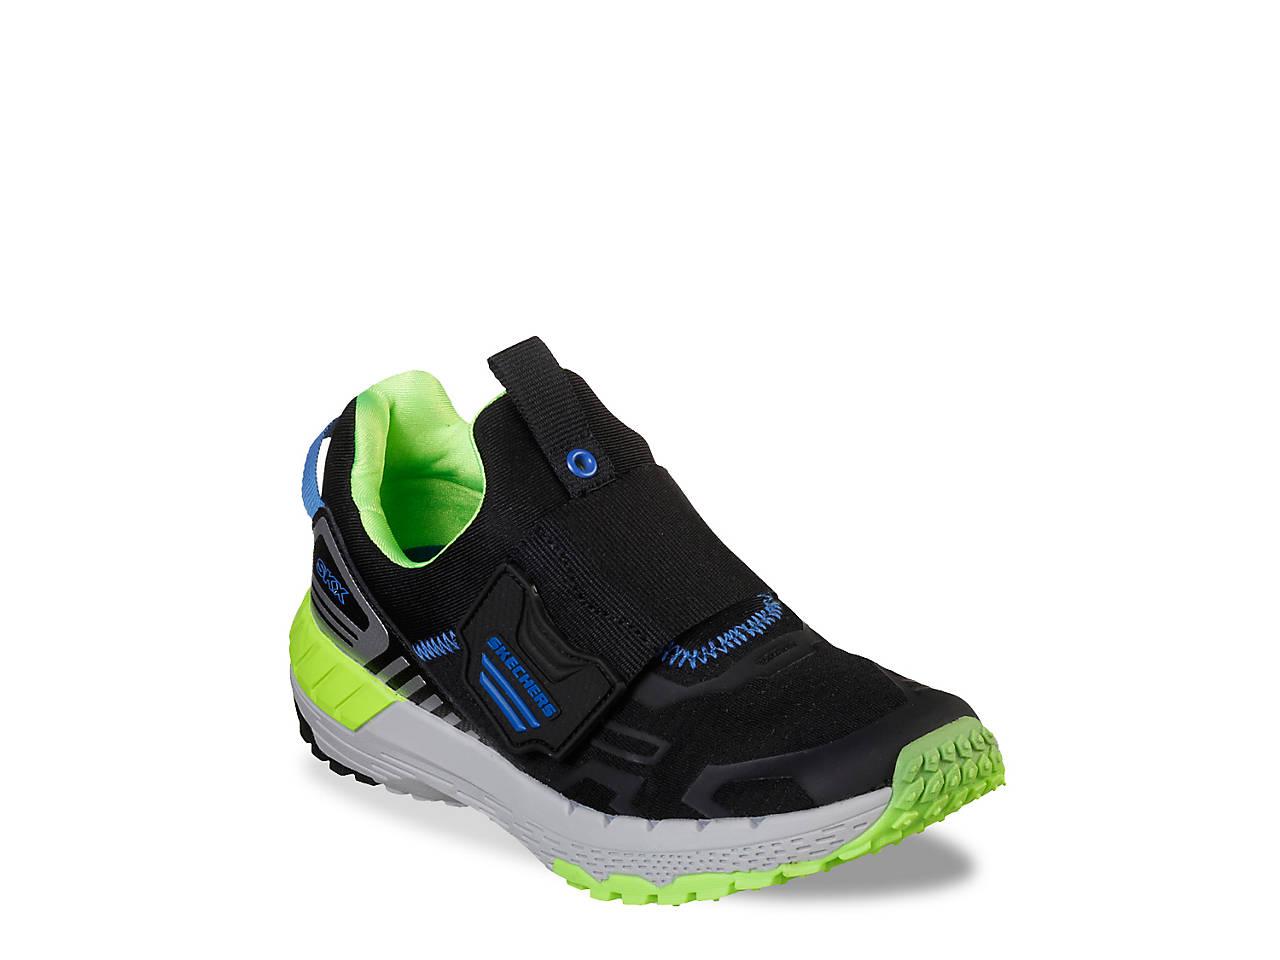 611feaab38a1 Skechers Hyperjolt 2.0 Nitroblast Toddler   Youth Sneaker Kids Shoes ...